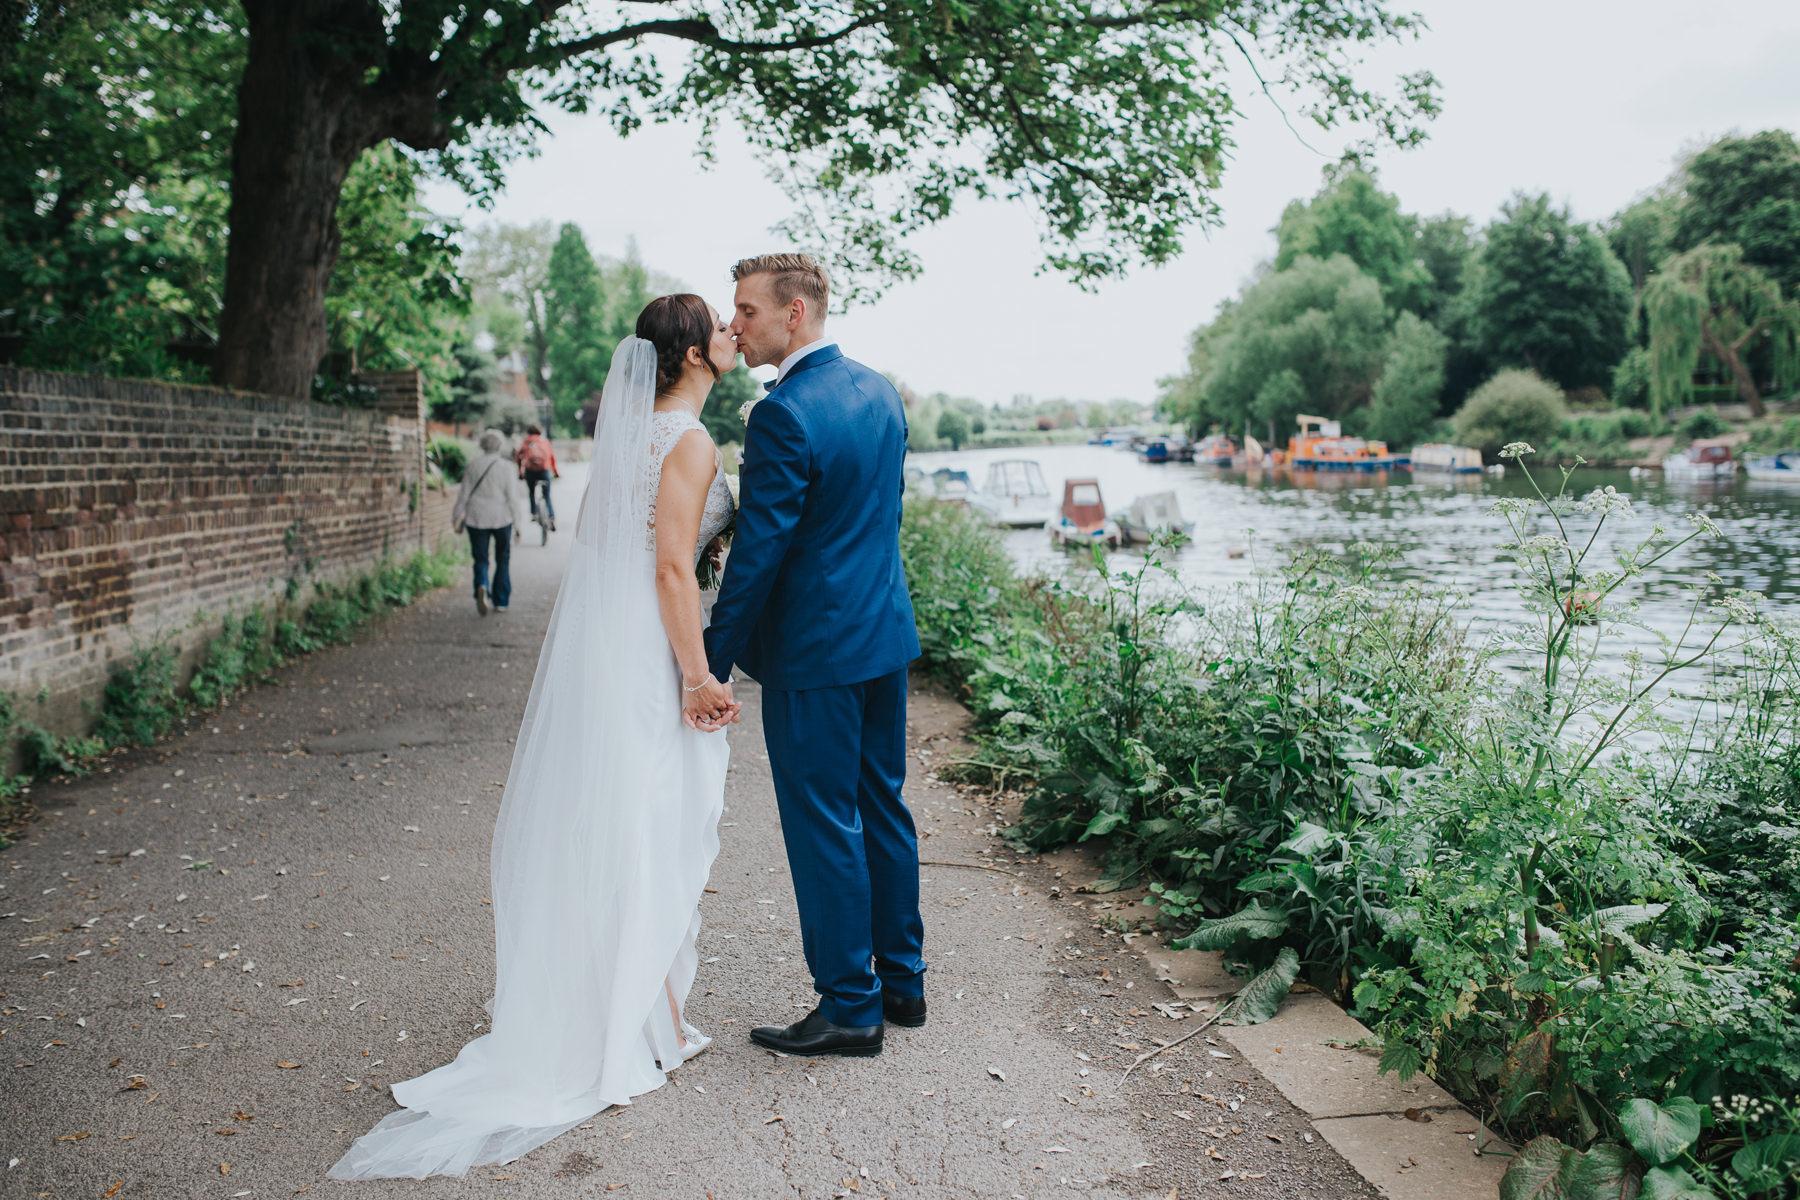 CRL-372-The Bingham wedding Richmond-Claire Rob bridal couple portraits on Thamespath.jpg